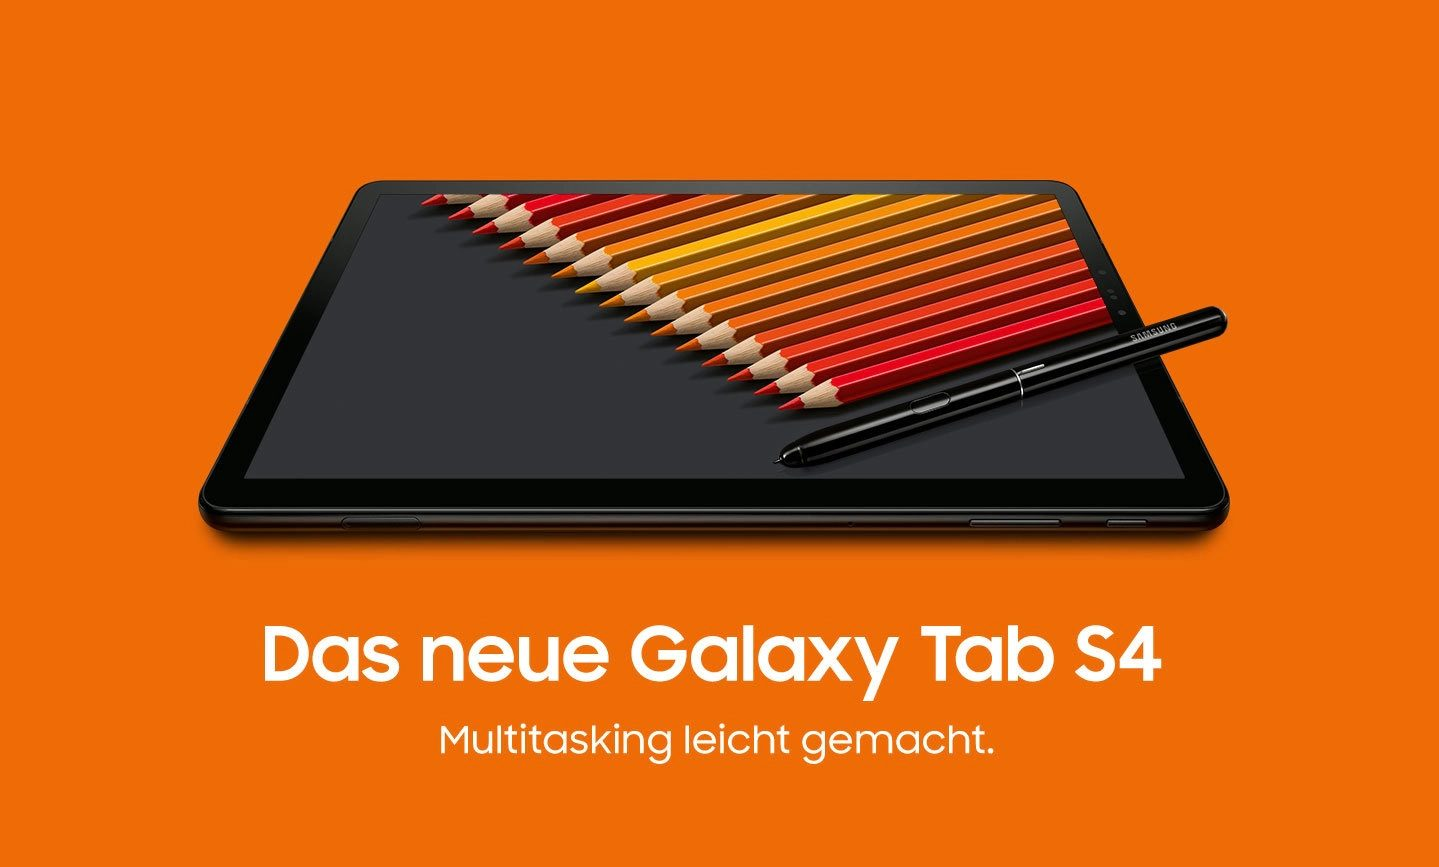 Samsung Galaxy Tab S4 64 GB zum Bestpreis als Ebay-Wow-Deal